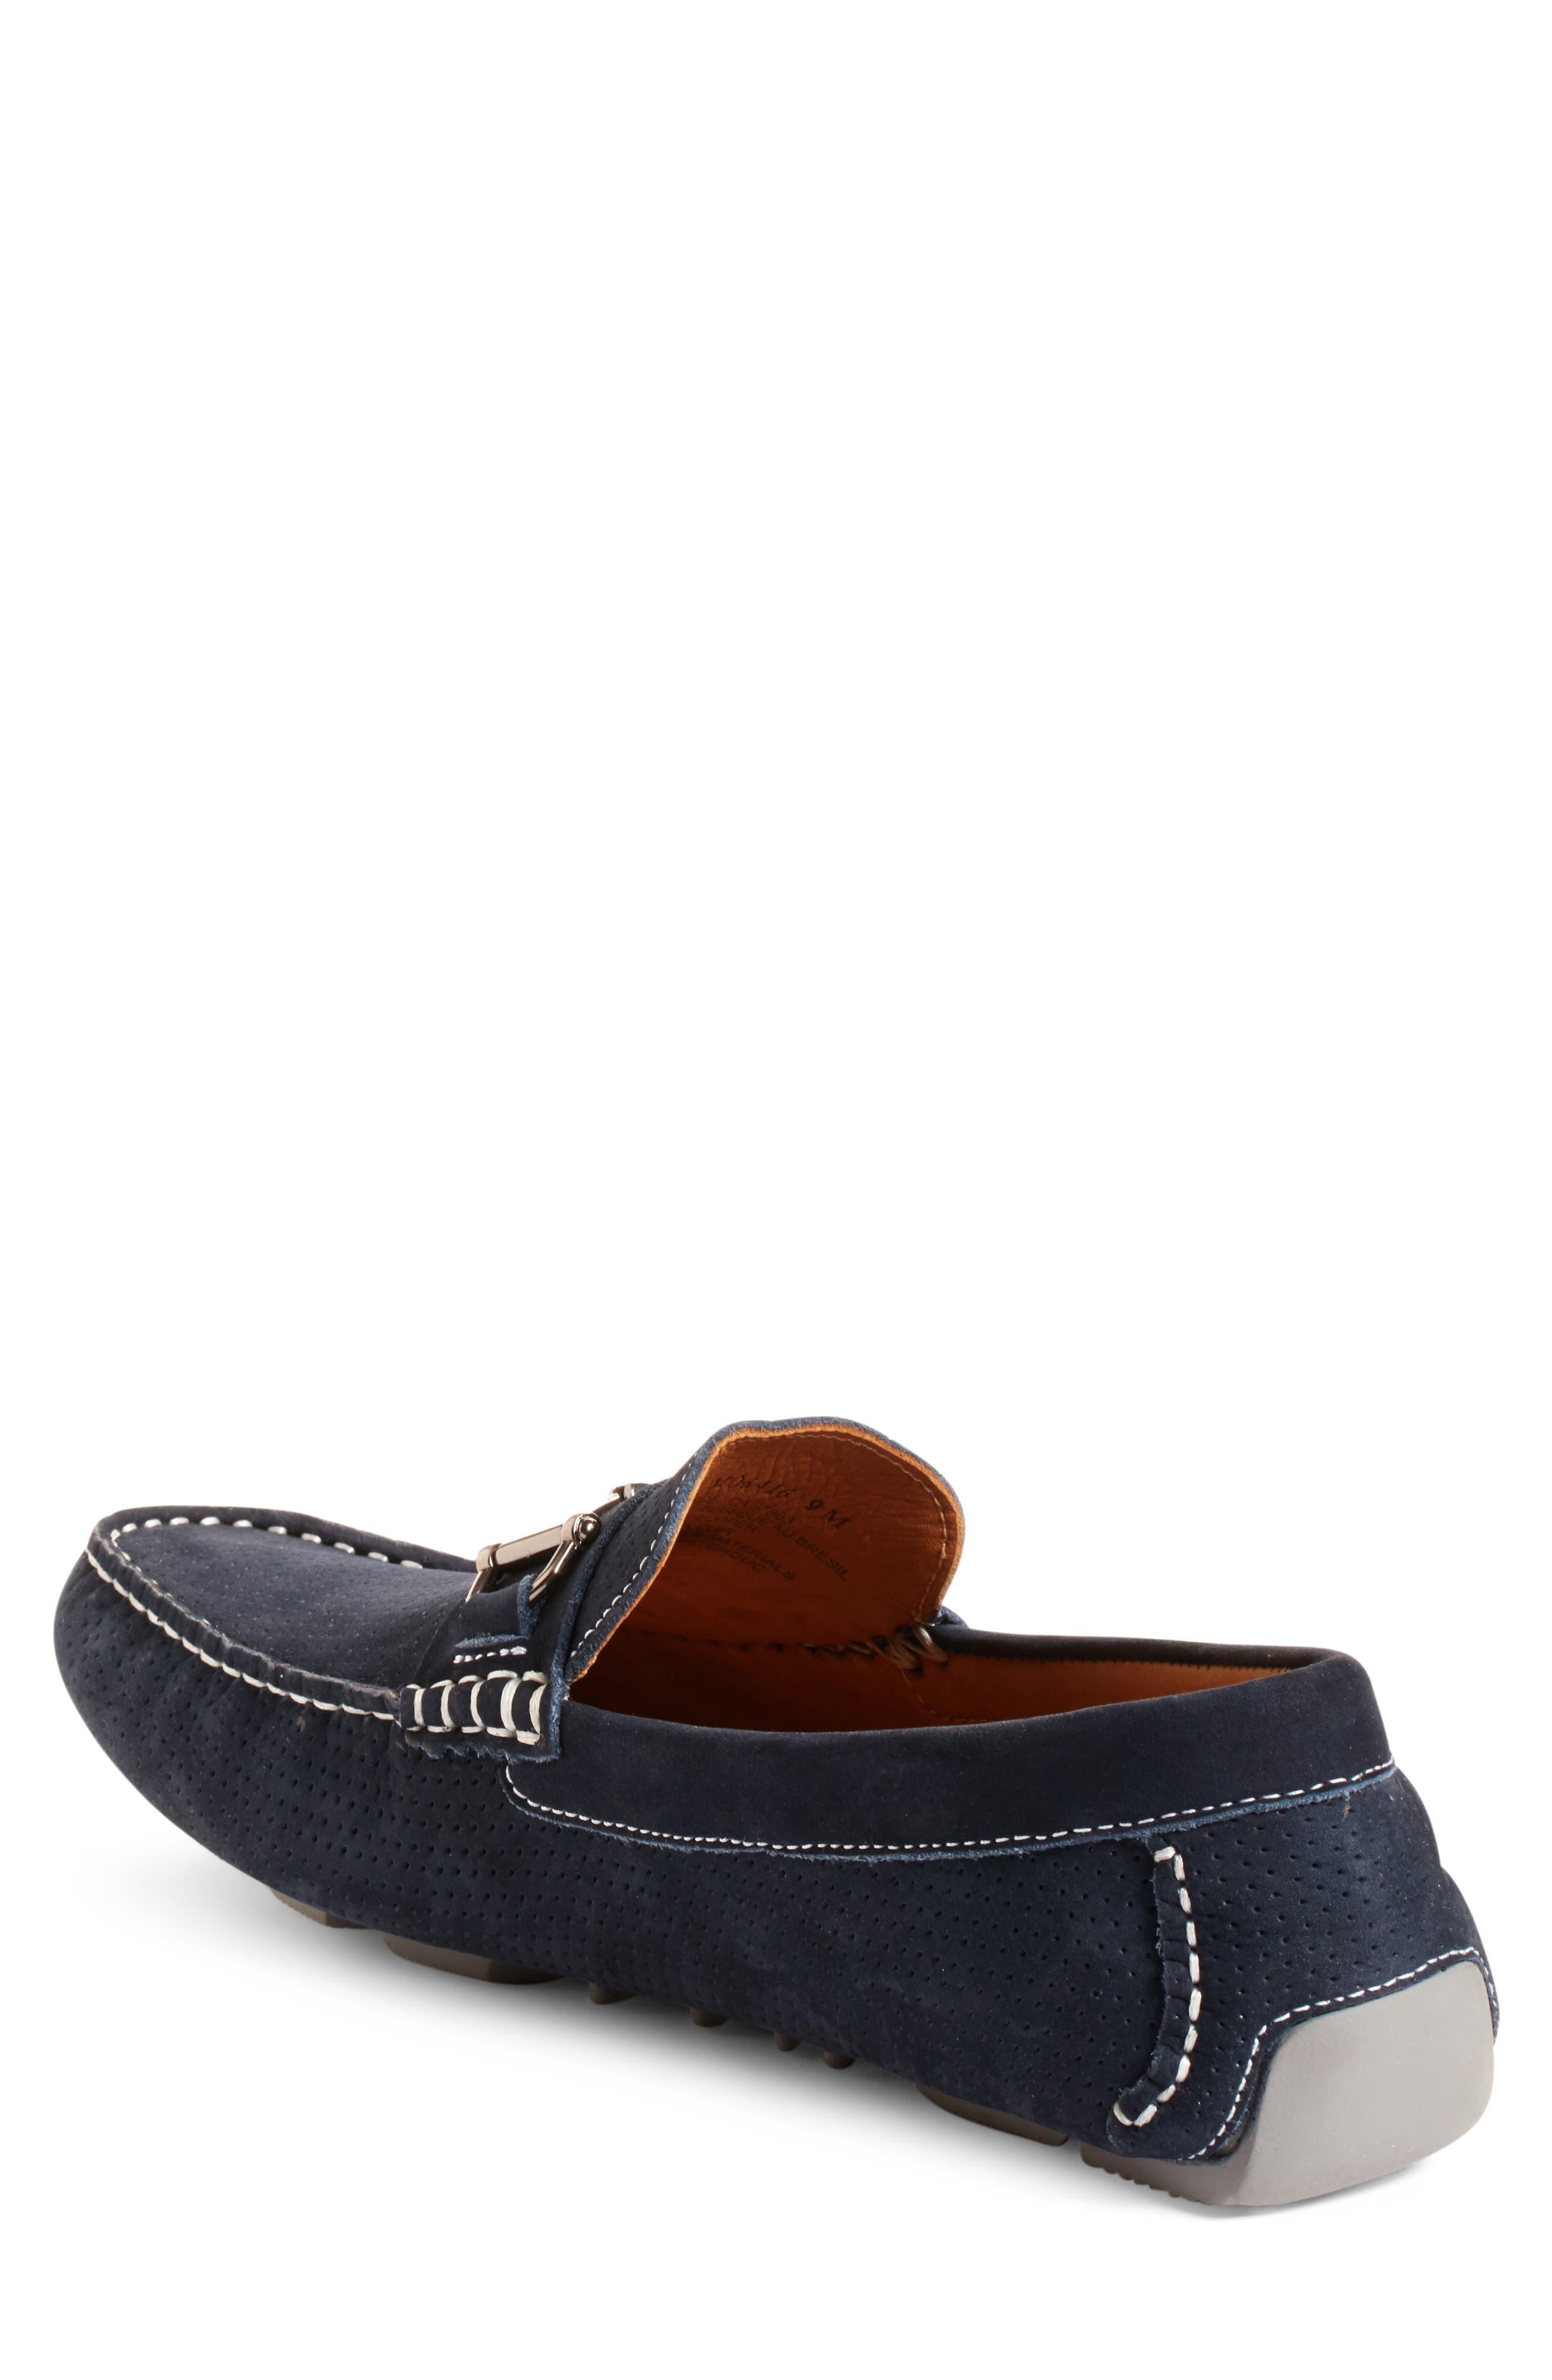 Alternate Image 2  - 1901 Destin Driving Shoe (Men)